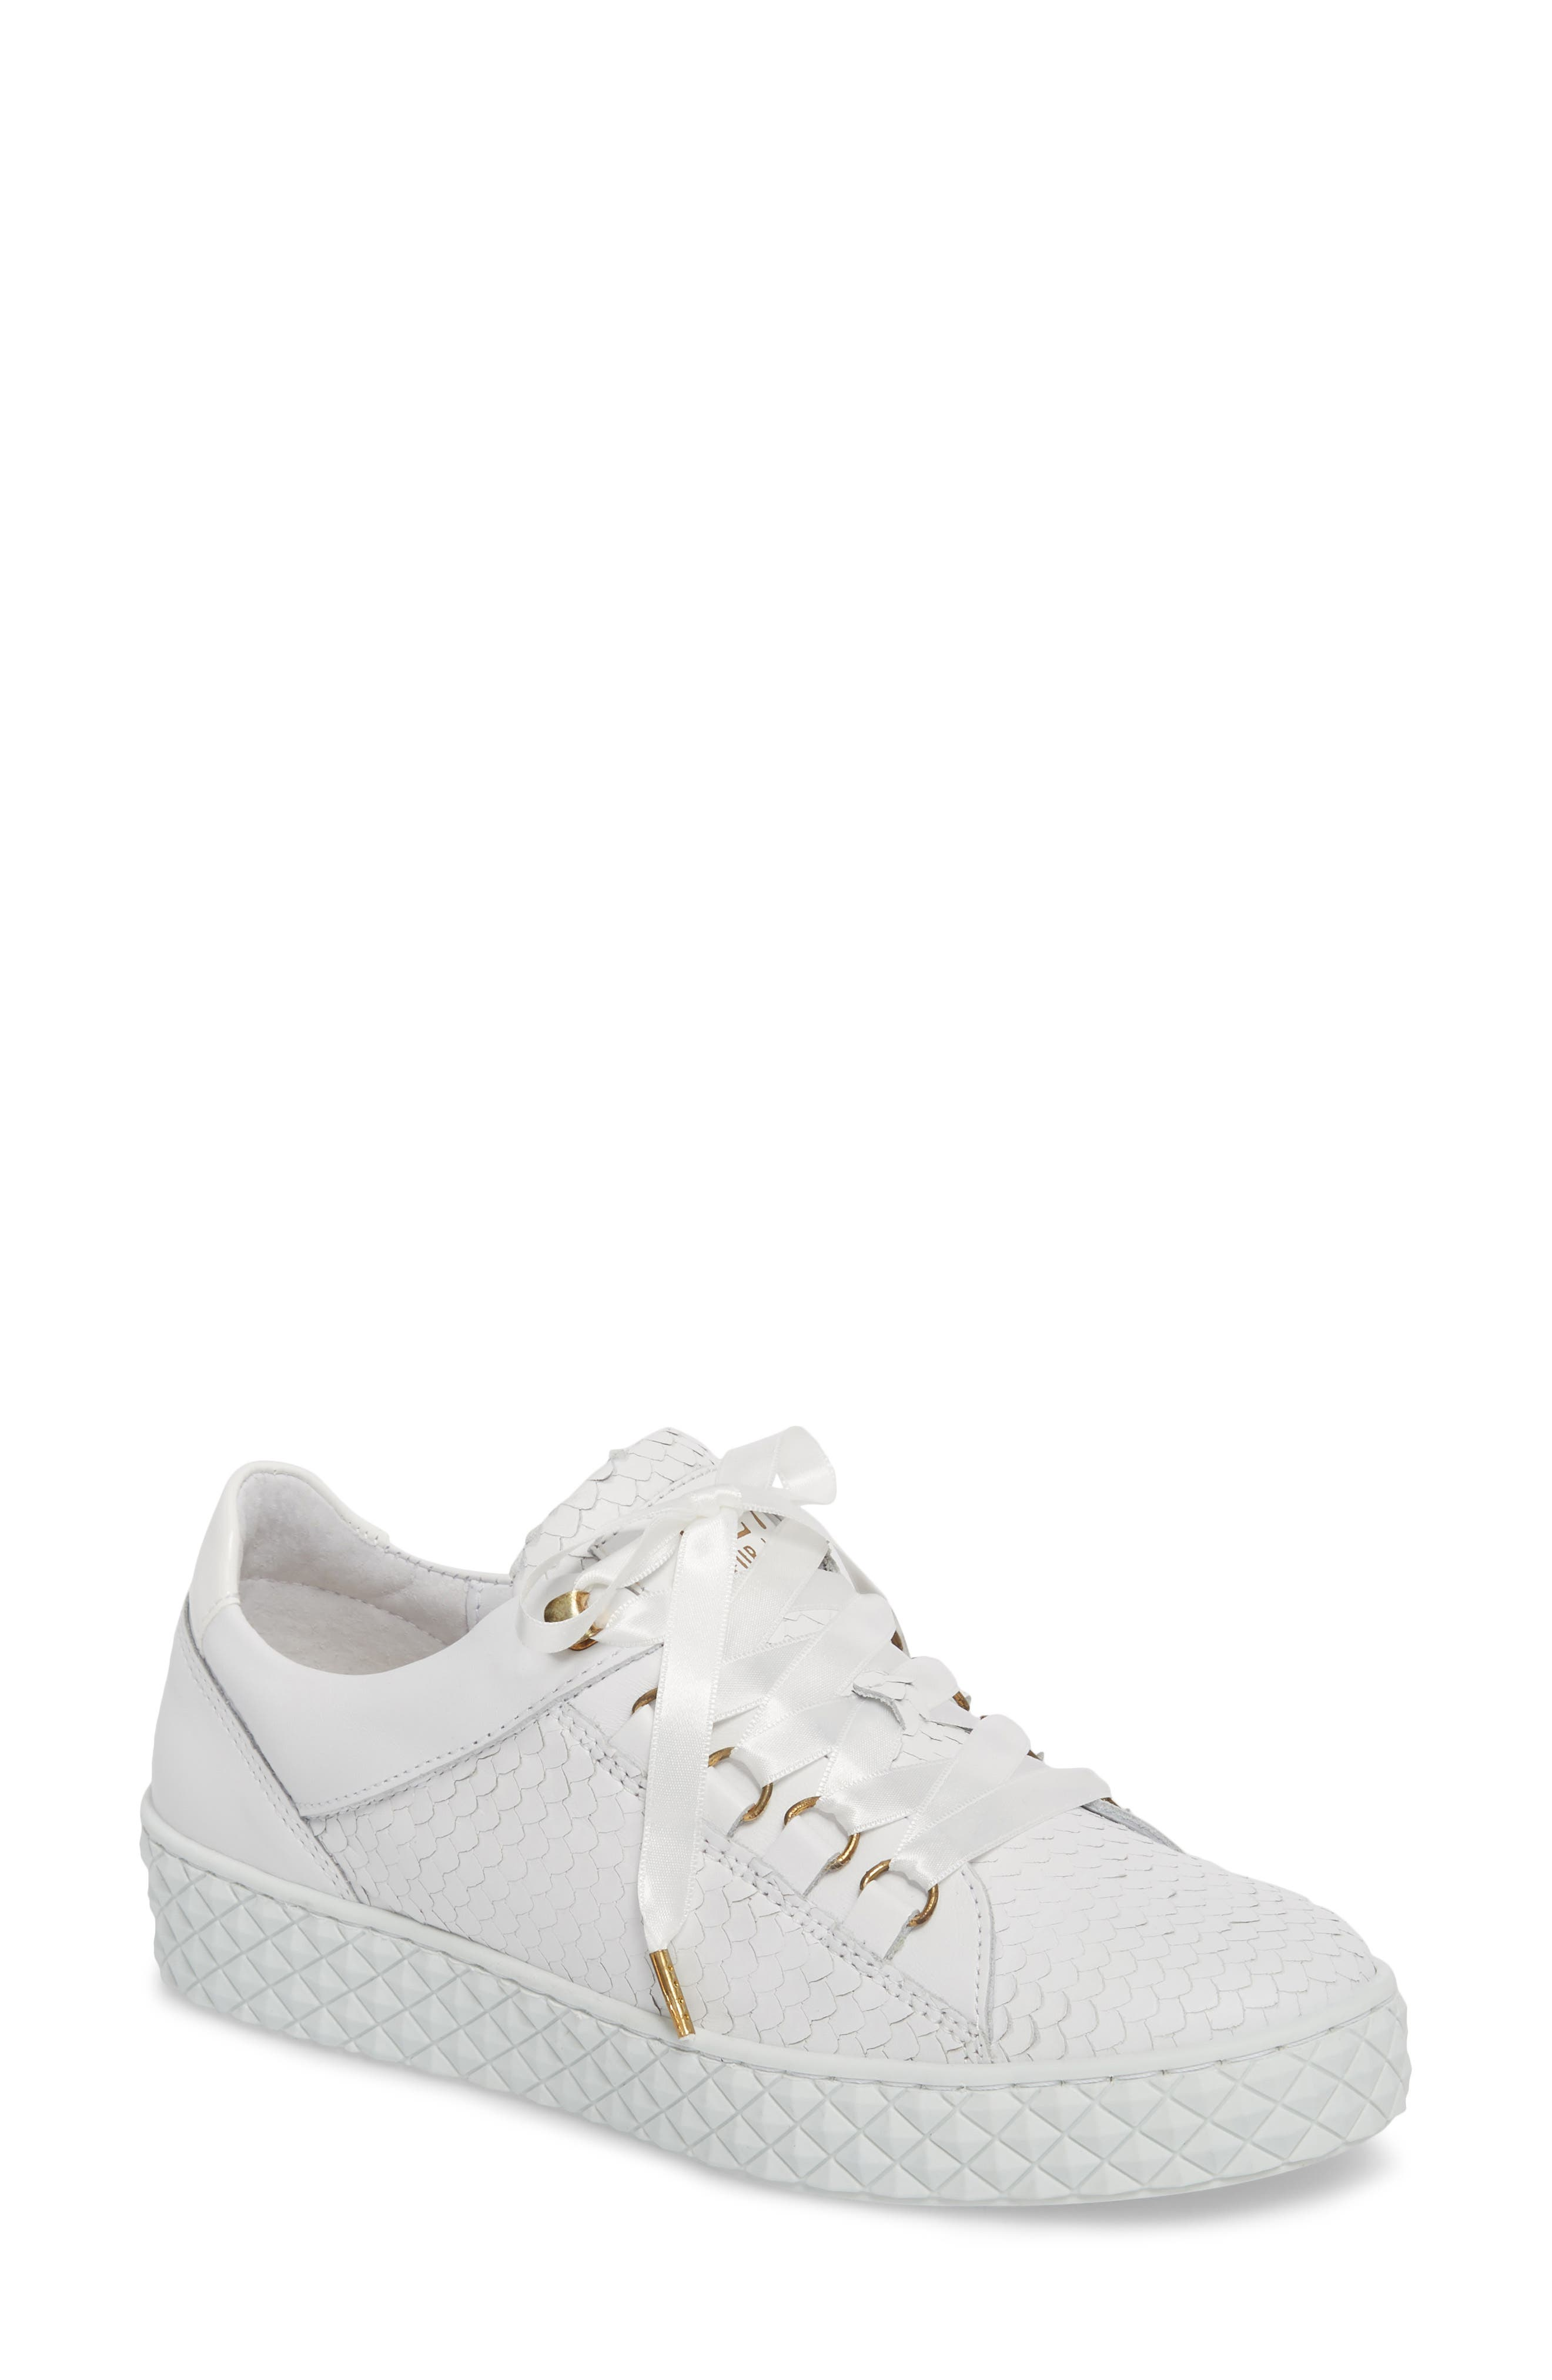 Seoul Sneaker,                             Main thumbnail 1, color,                             Optic White Leather